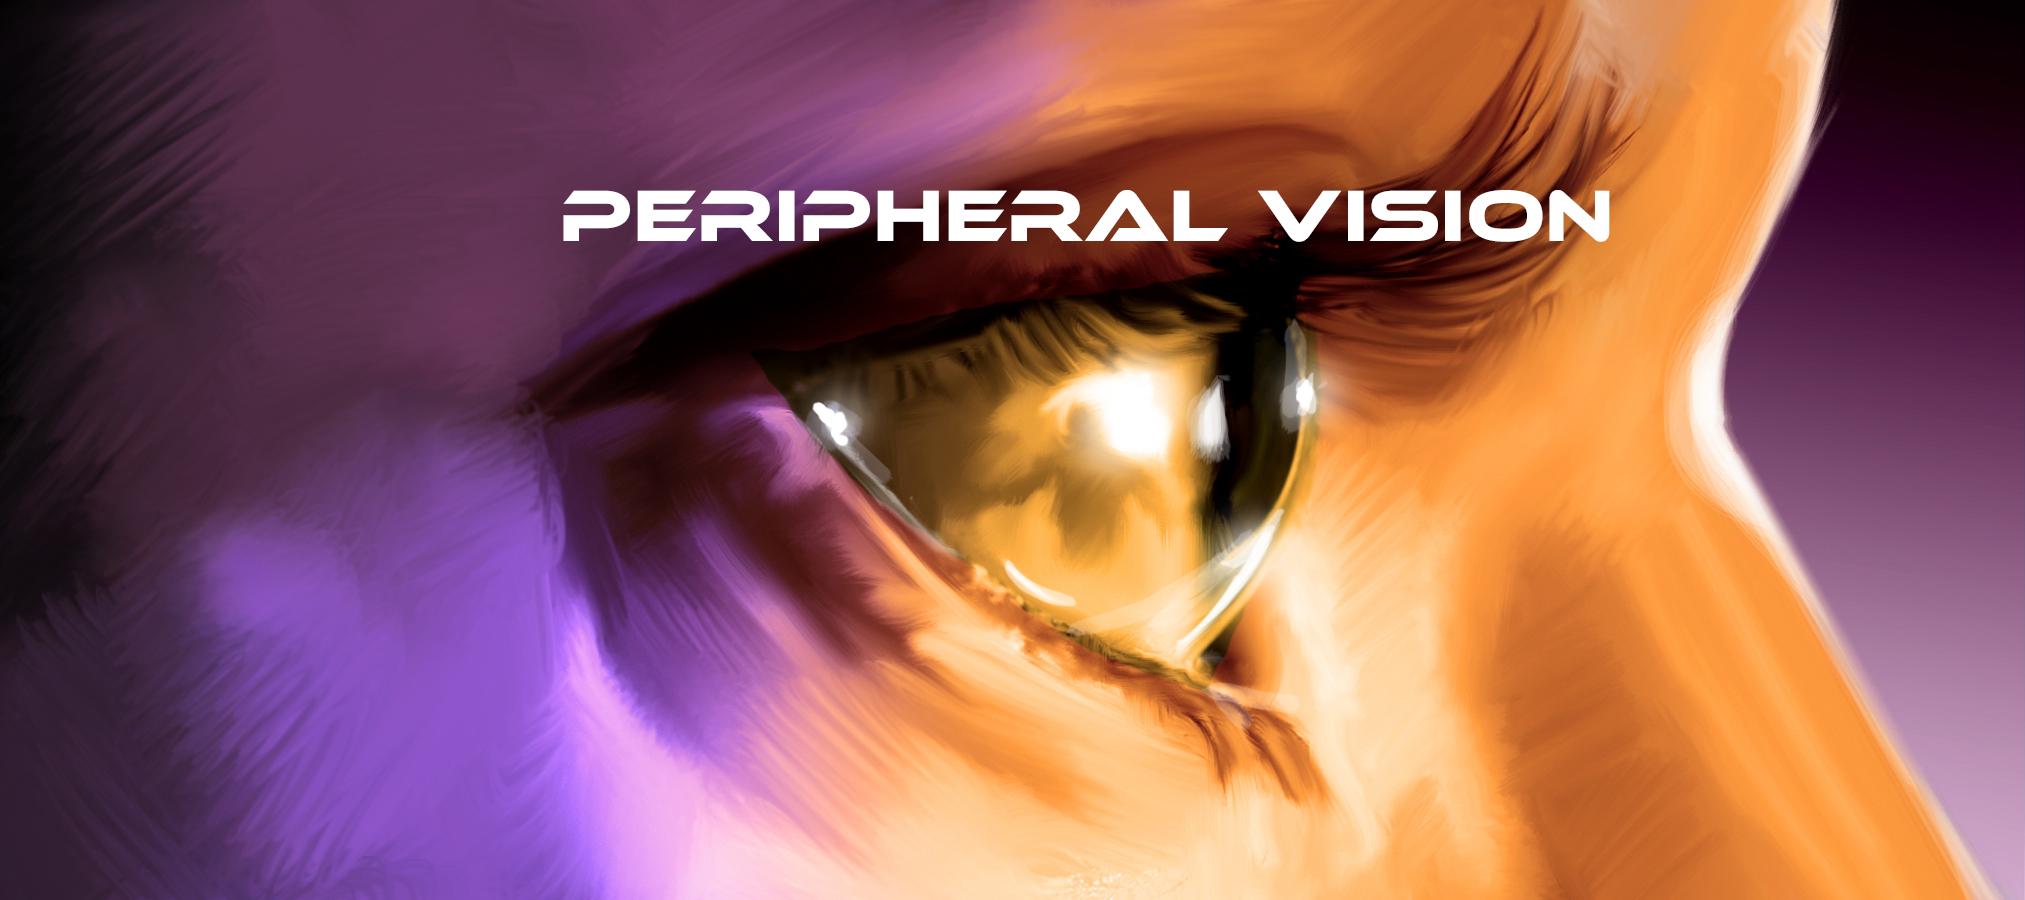 Periphrial Vision